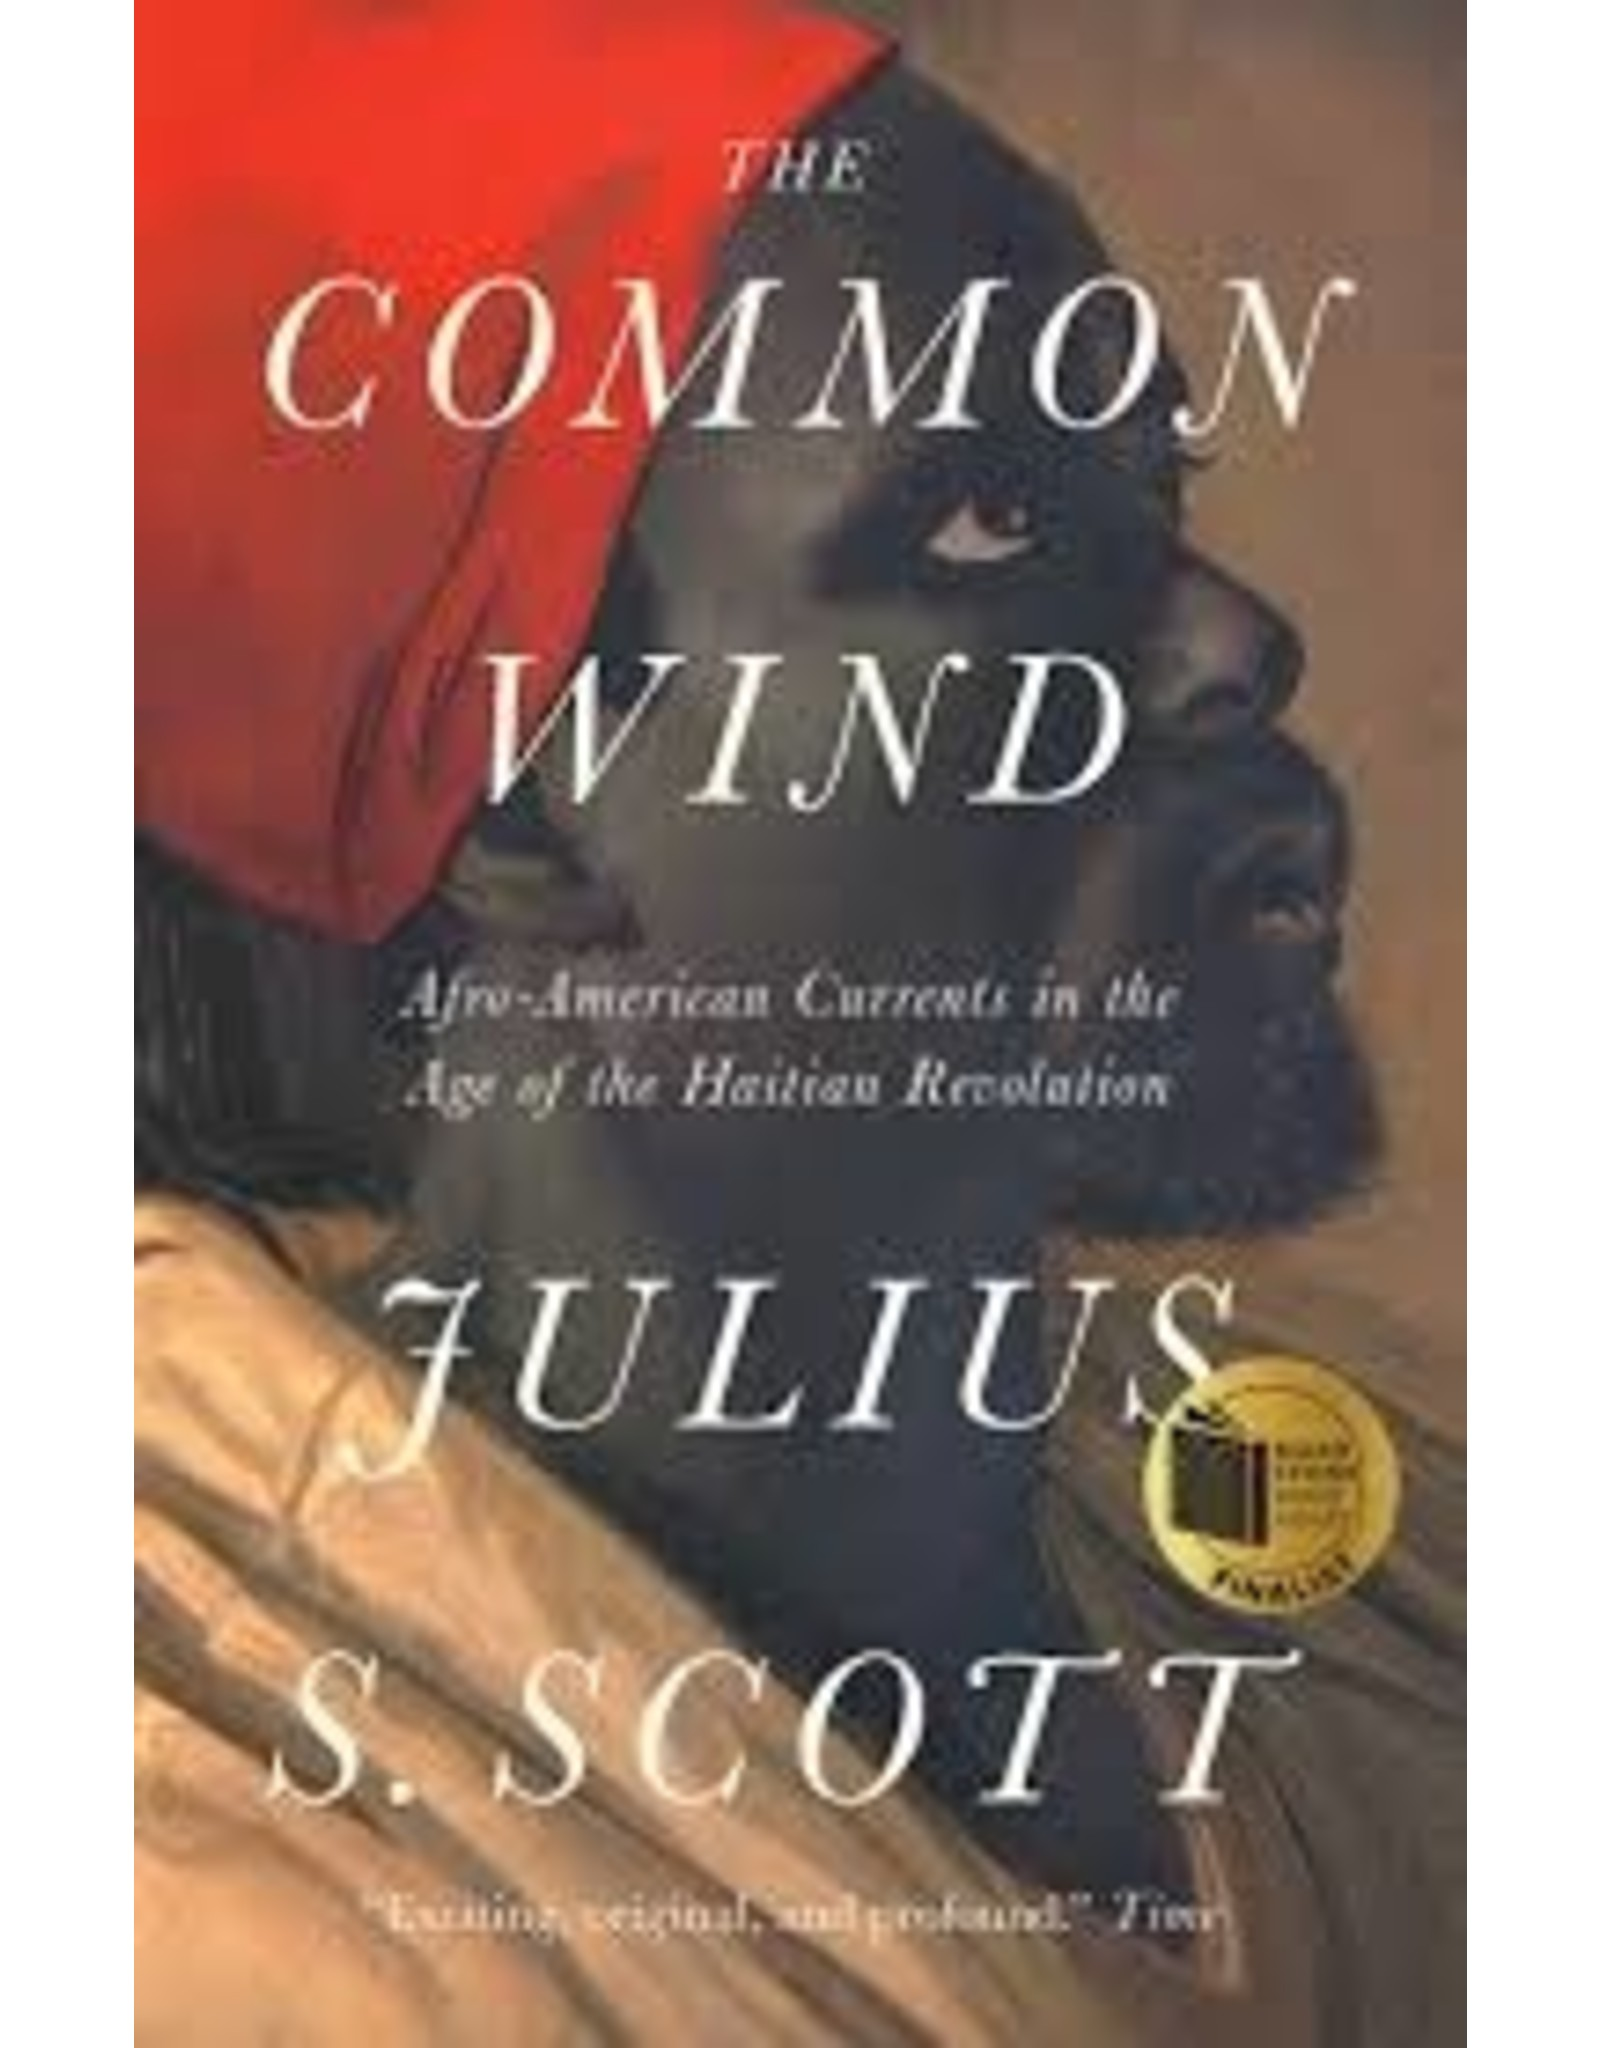 Books The Common Wind by Julius S. Scott